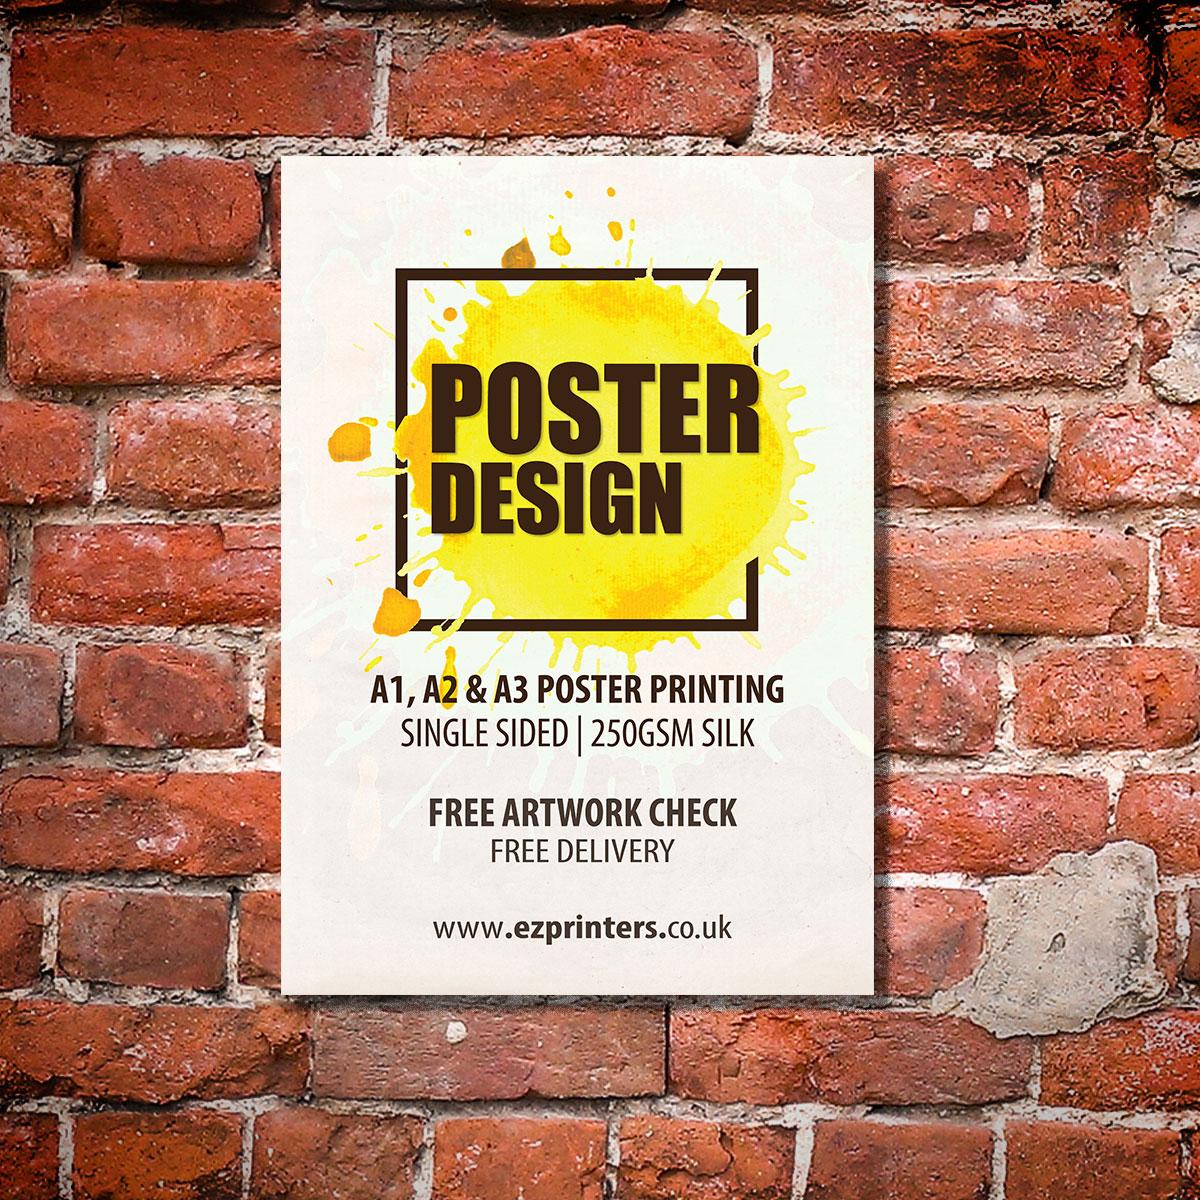 london best a1 poster trade printer company ec1 near me